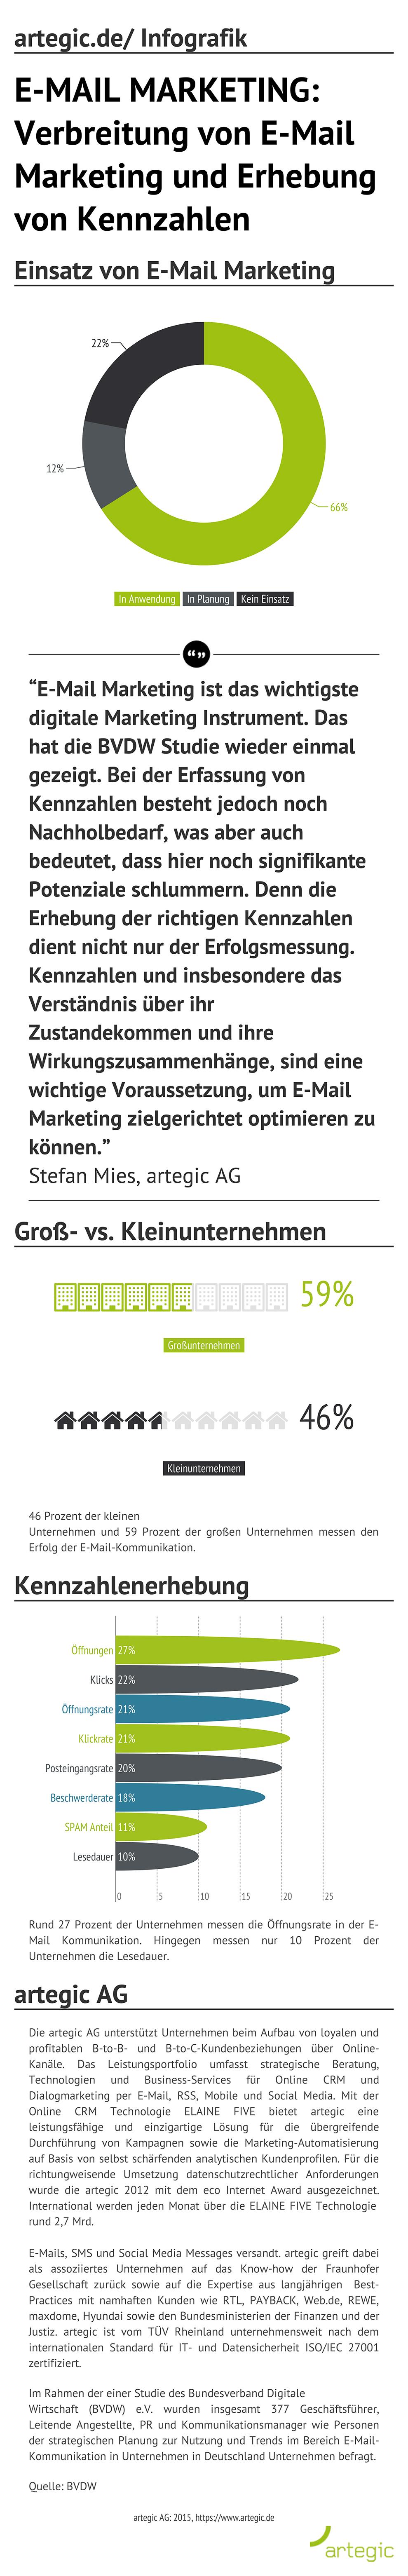 artegic_de,-Infografik_-email-marketing